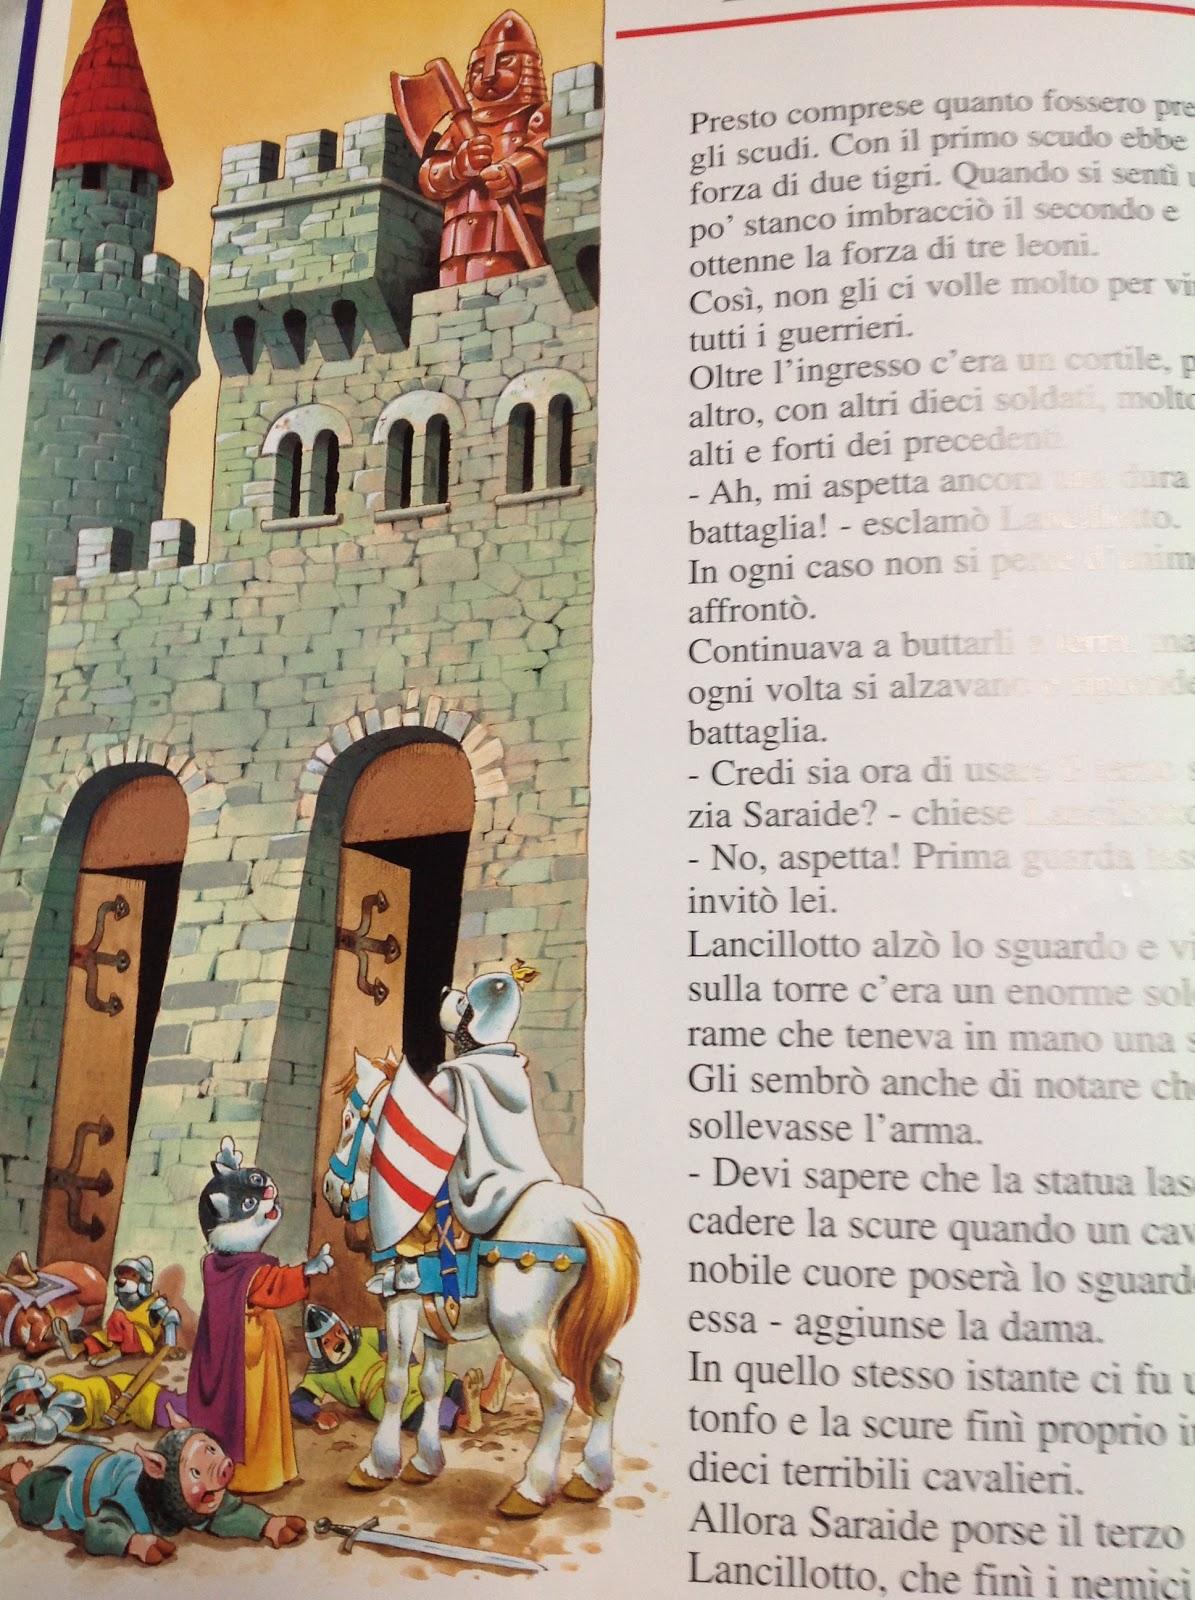 Mammavvocato - Re artu ei cavalieri della tavola rotonda libro ...